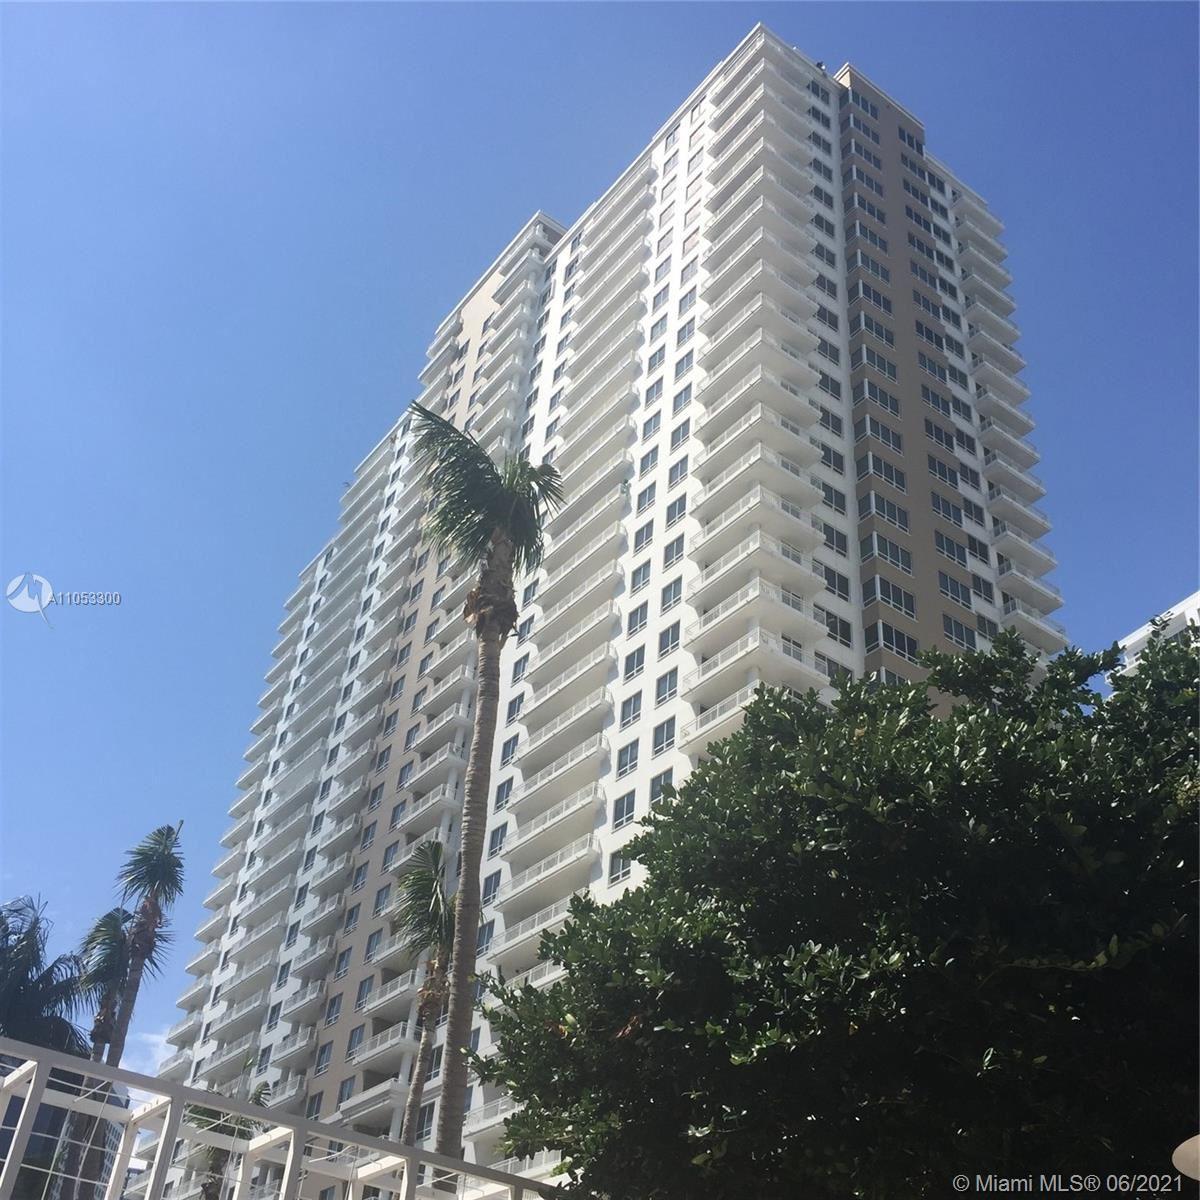 801 Brickell Key Blvd #1901, Miami, FL 33131 - #: A11053300